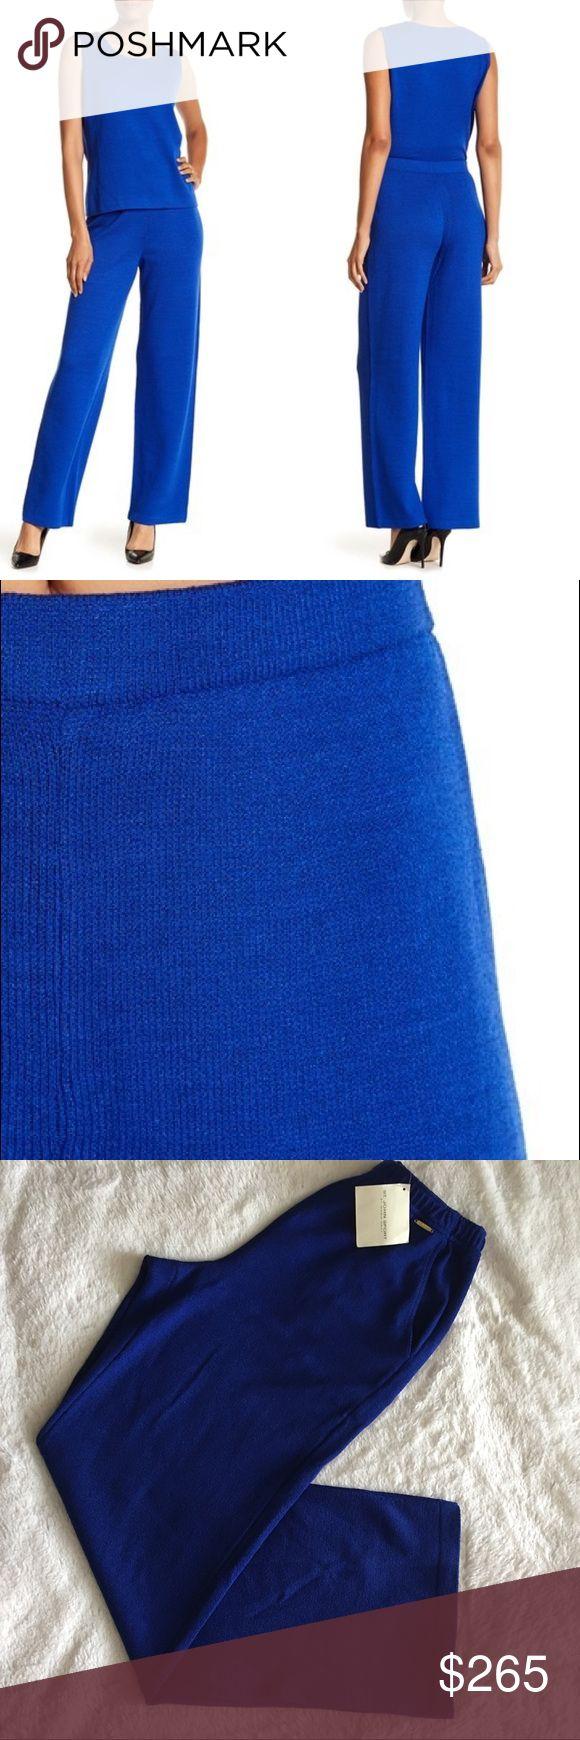 "NWT St. John Collection wide leg wool pants St. John collection wide leg wool pants in the most beautiful cobalt blue. NWT! Would best 25""-26"" waist or size S. St. John Collection Pants"